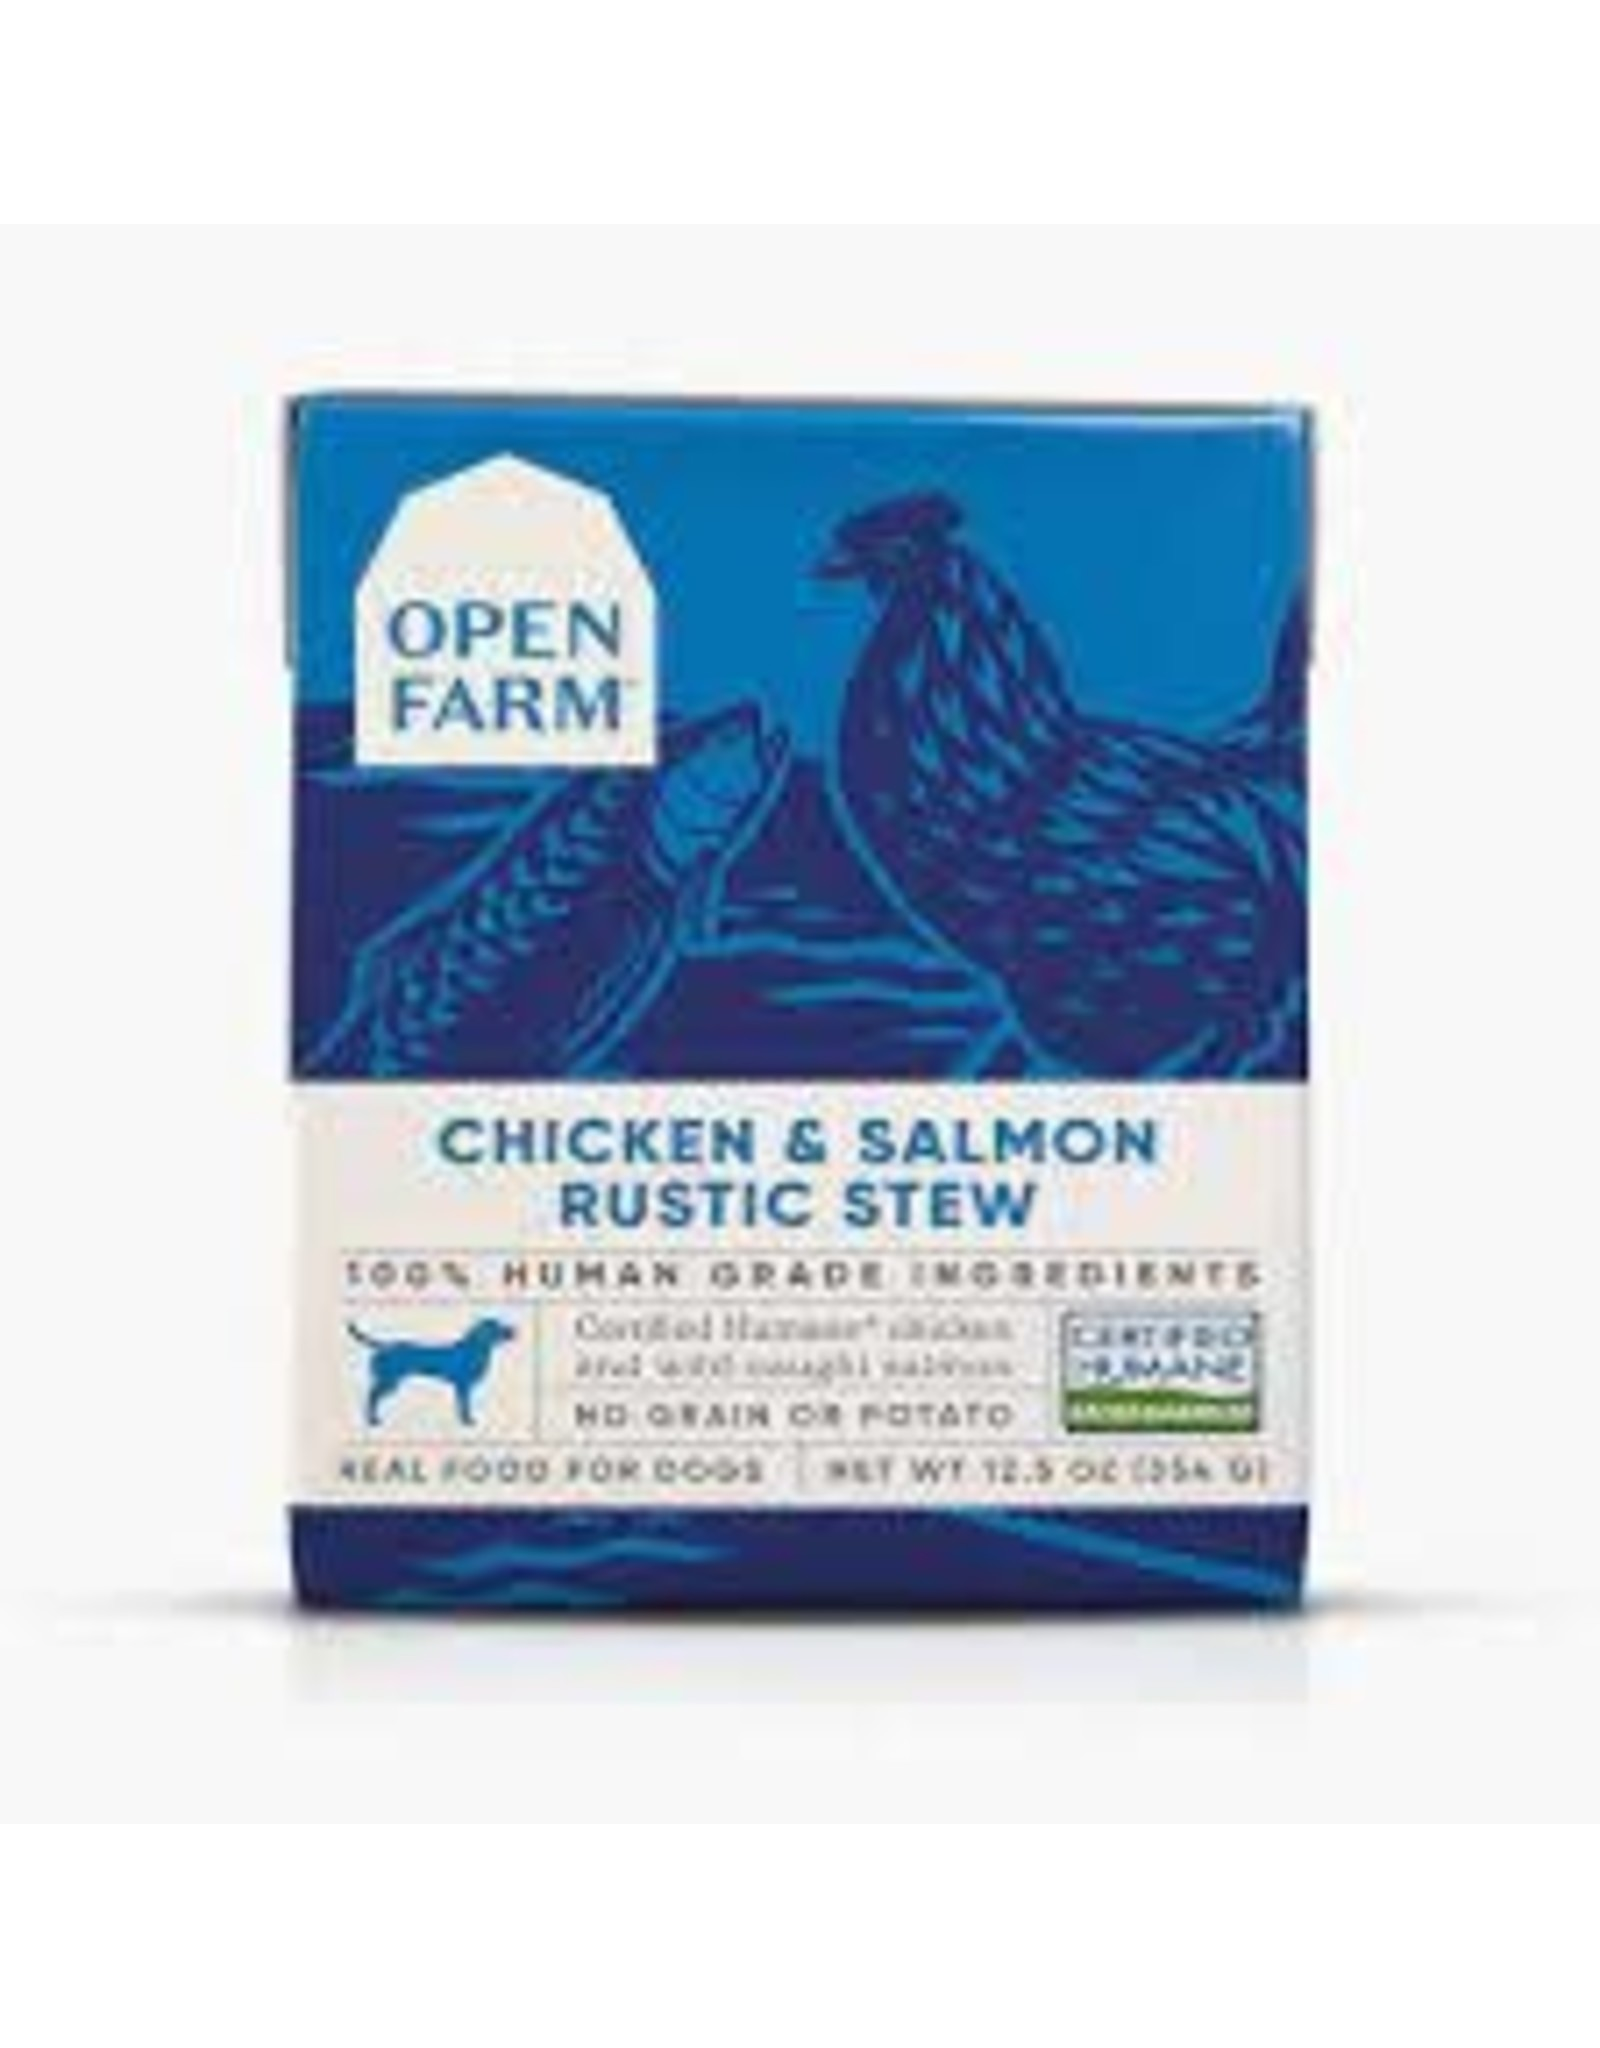 Open Farm Chicken & Salmon Rustic Stew, 12.5oz